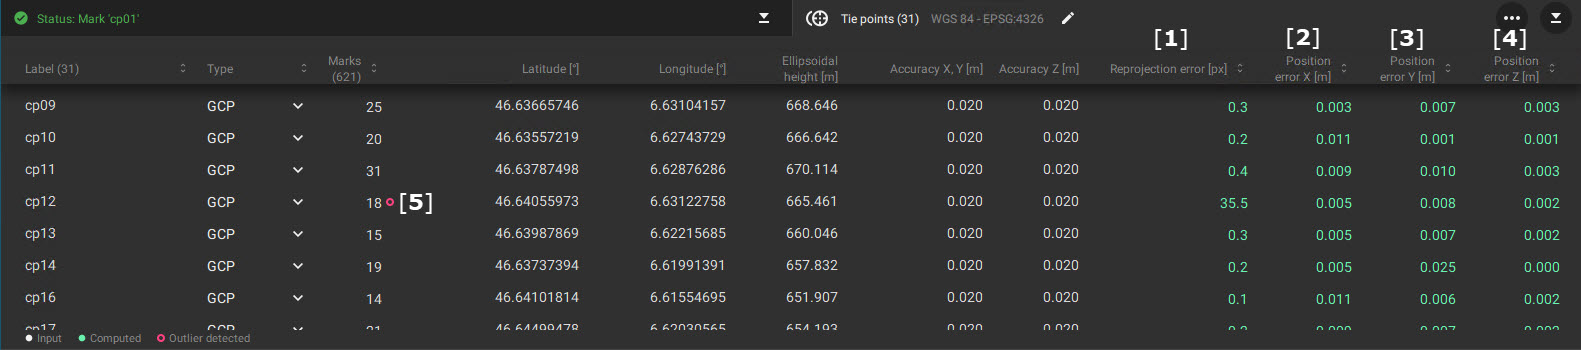 Pix4Dmatic_tie_point_quality_check.jpg